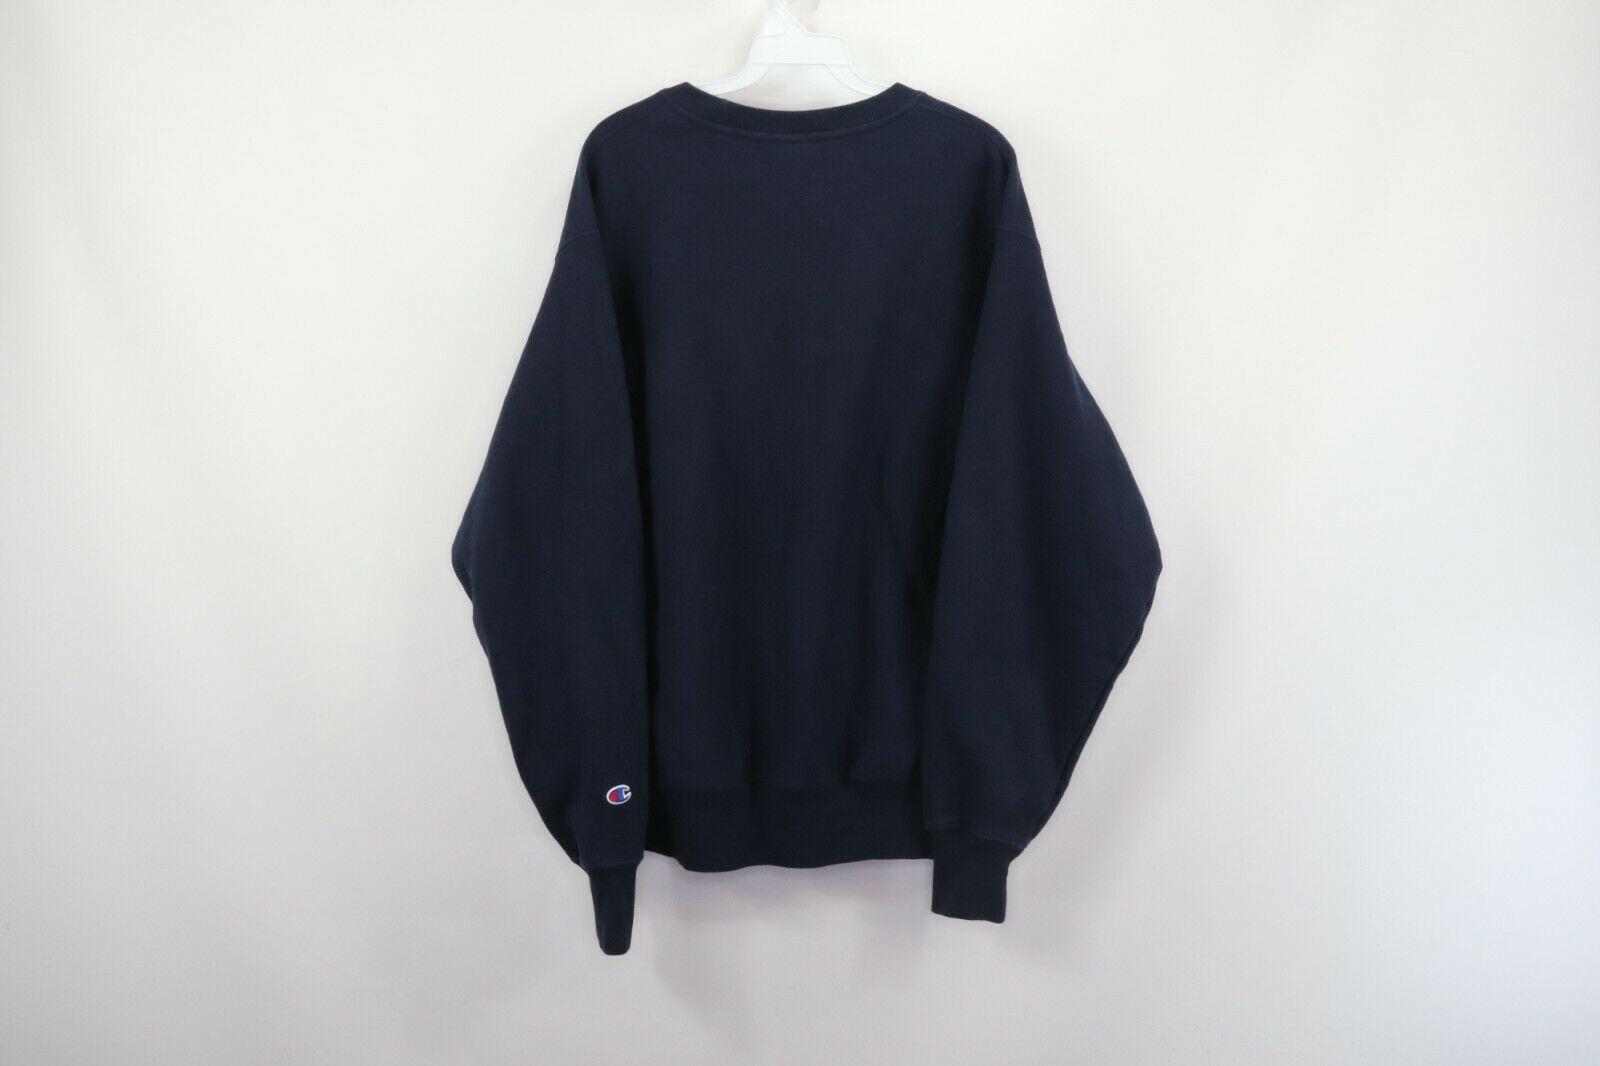 Champion Reverse Weave Mens Large Optimize Spell Out Crewneck Sweatshirt Blue image 7